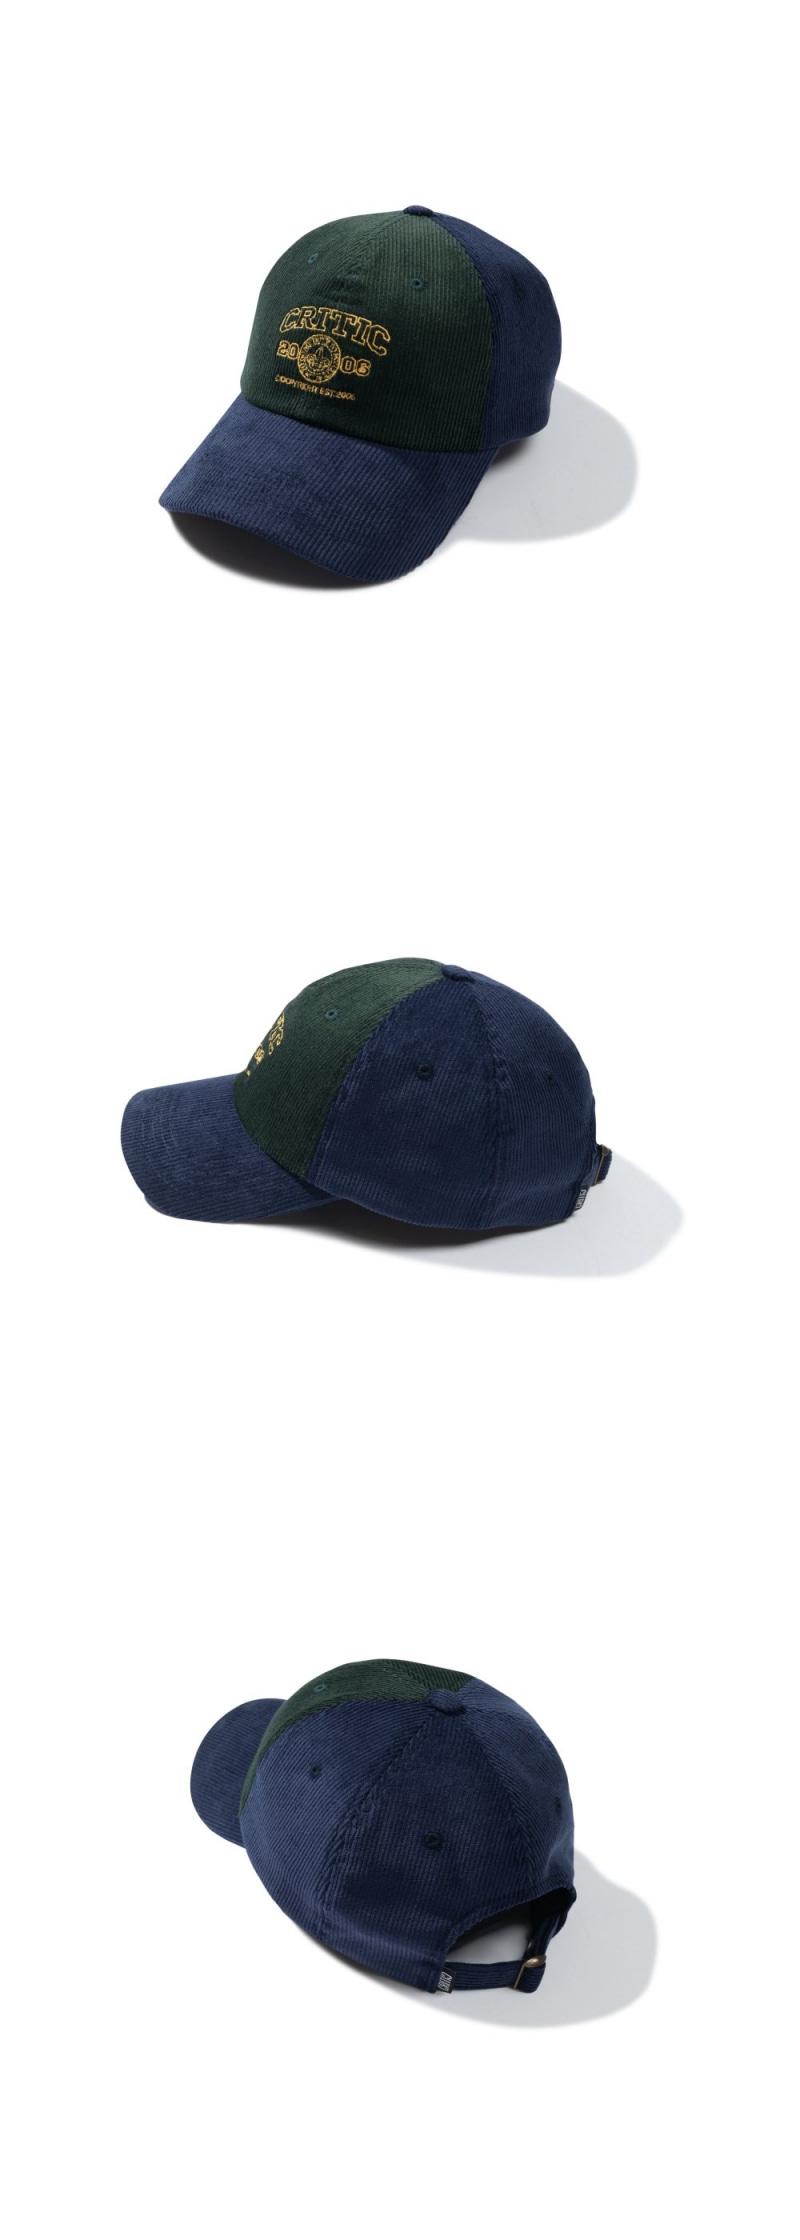 CORDUROY COLOR BLOCK BALL CAP(FOREST GREEN)_CTTZAHW02UG1